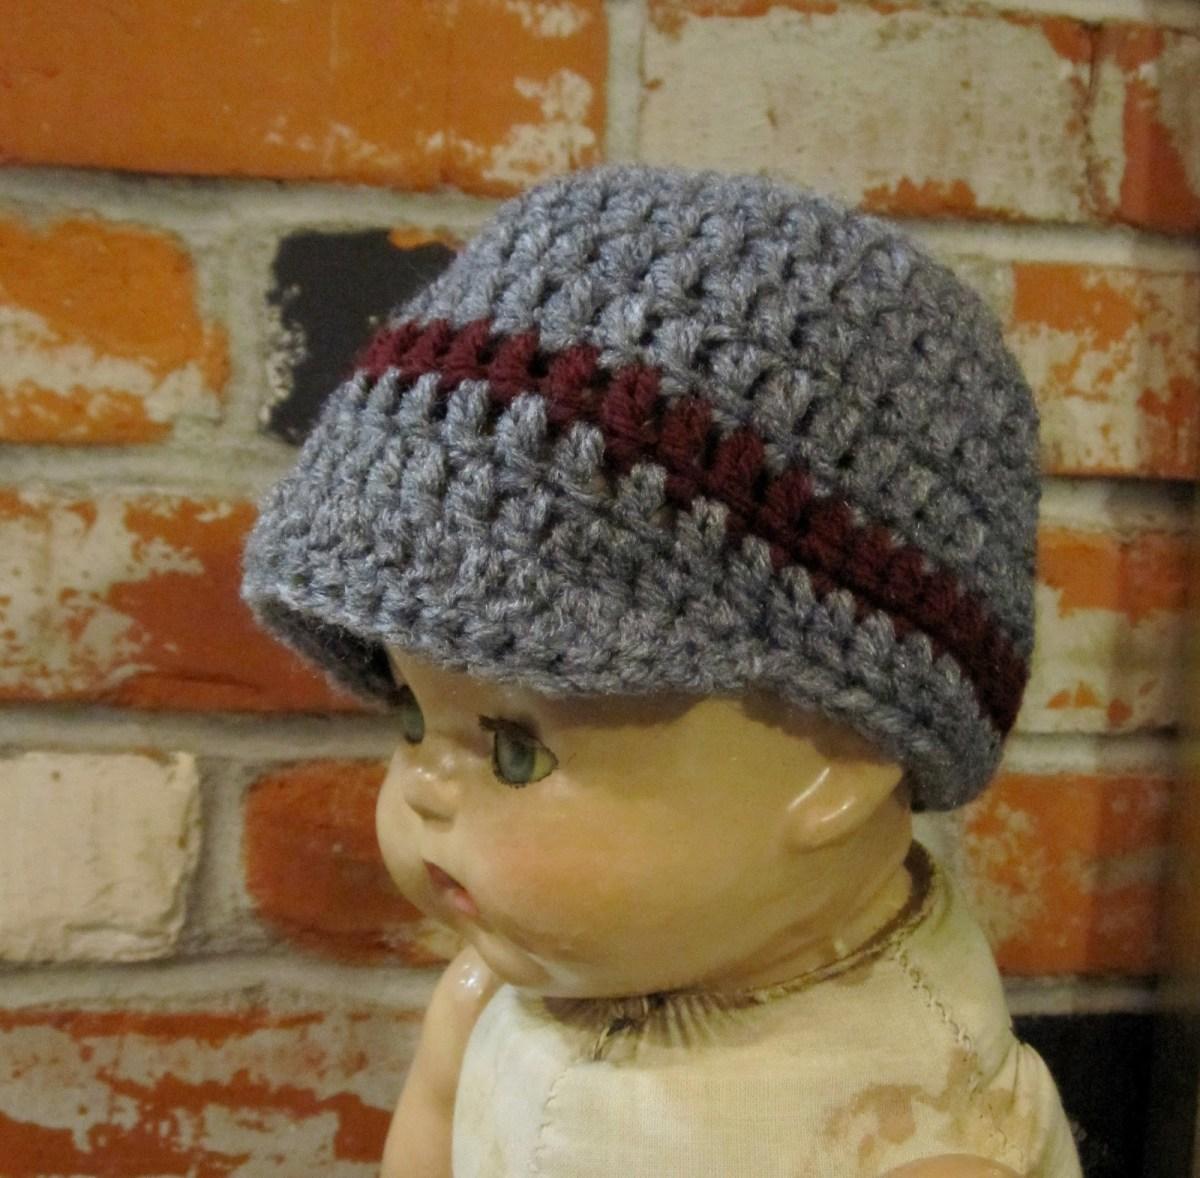 Crochet Newborn Newsboy Hat Pattern Free Breezybot Free Pattern Breezybot Newborn Newsboy